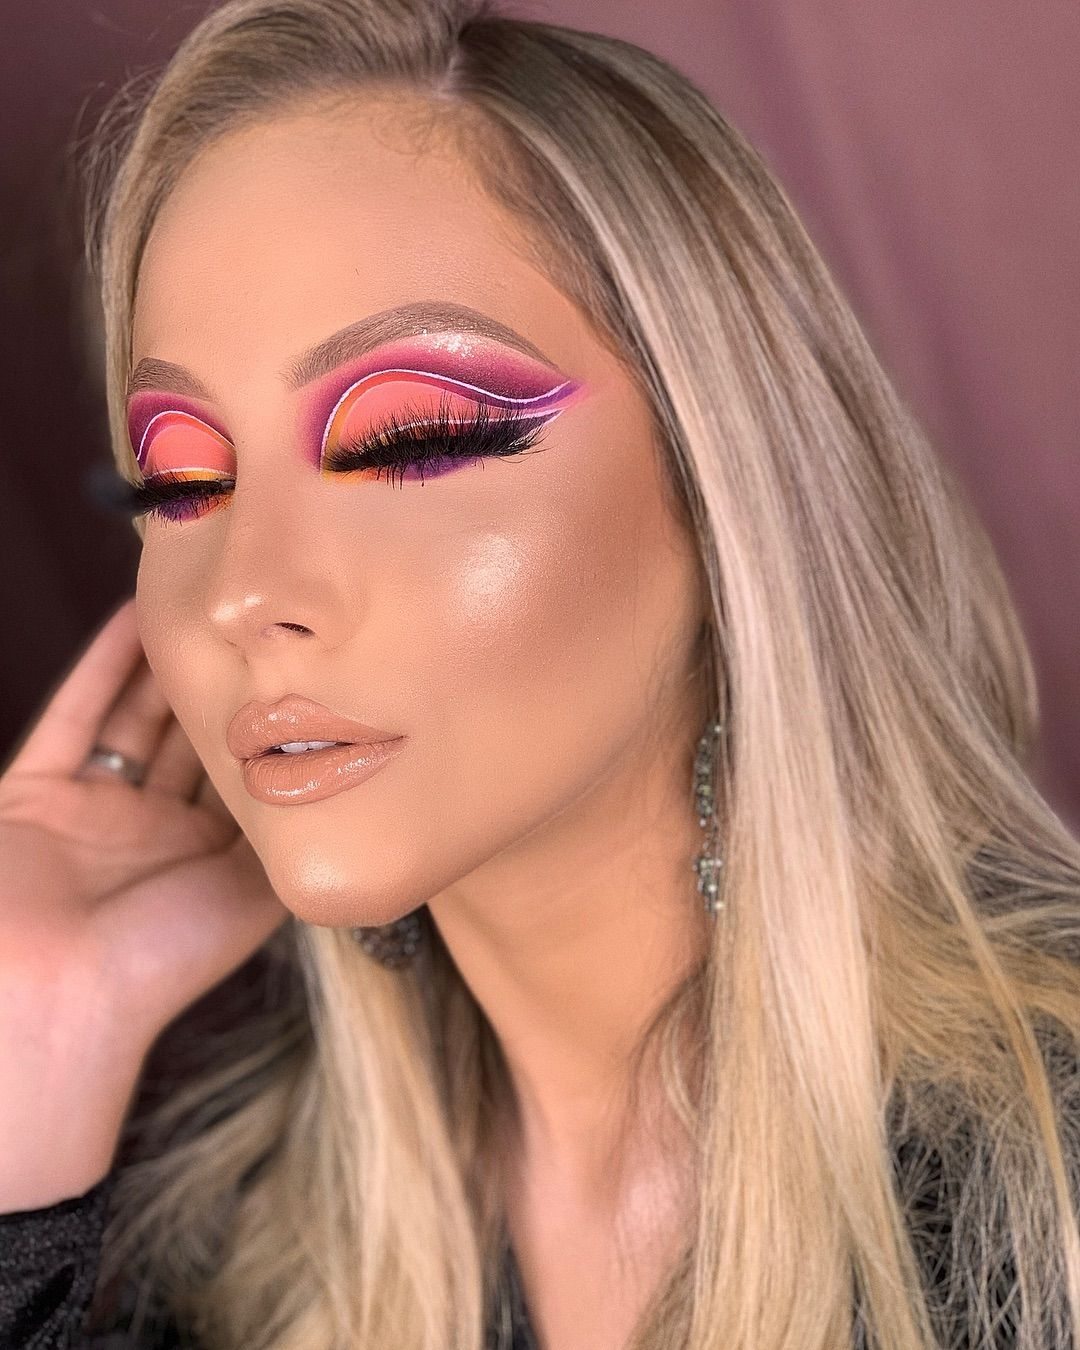 Pin de Debora Lunardi em Makeup Goals   Maquiagem colorida